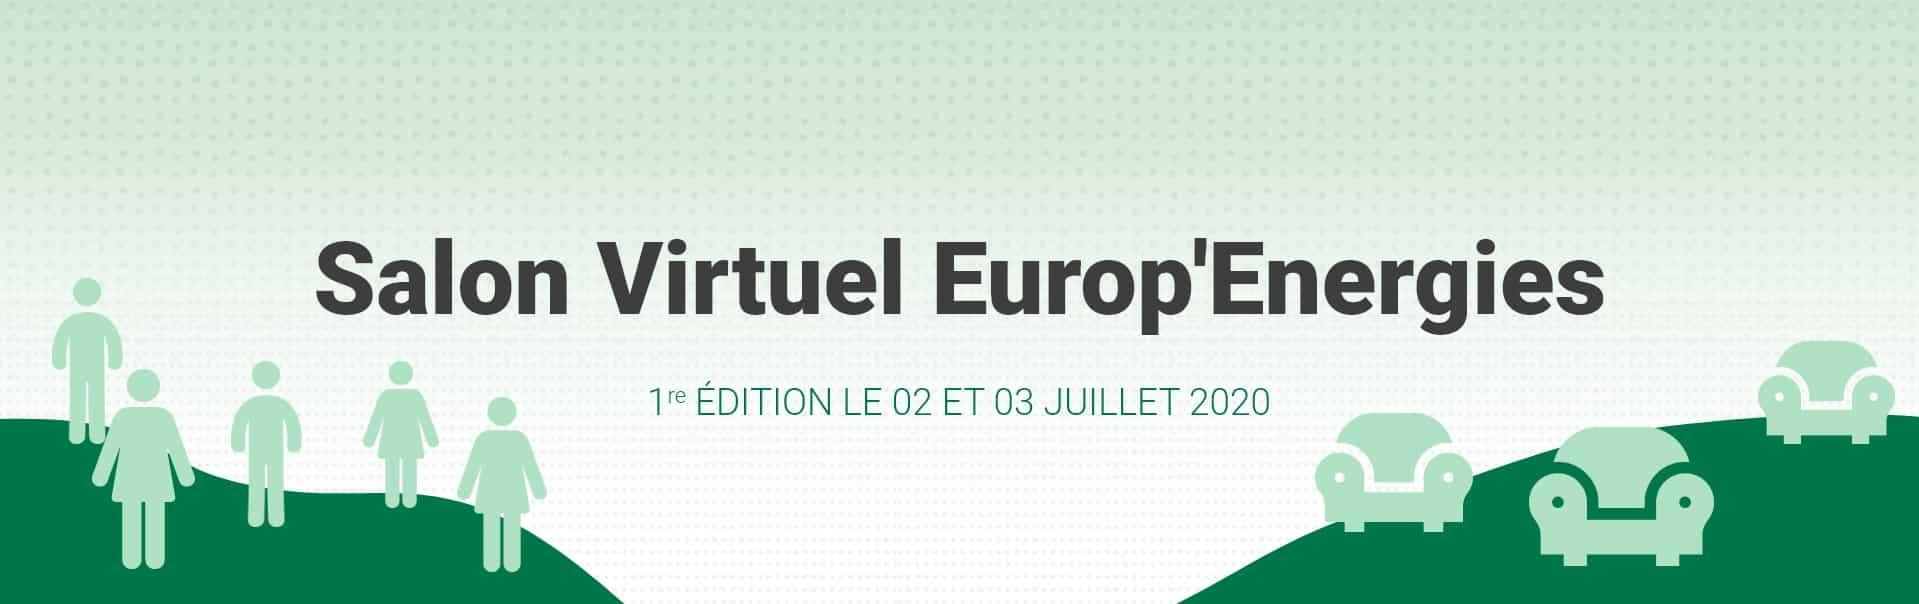 Salon Virtuel Forum Europ'Energies